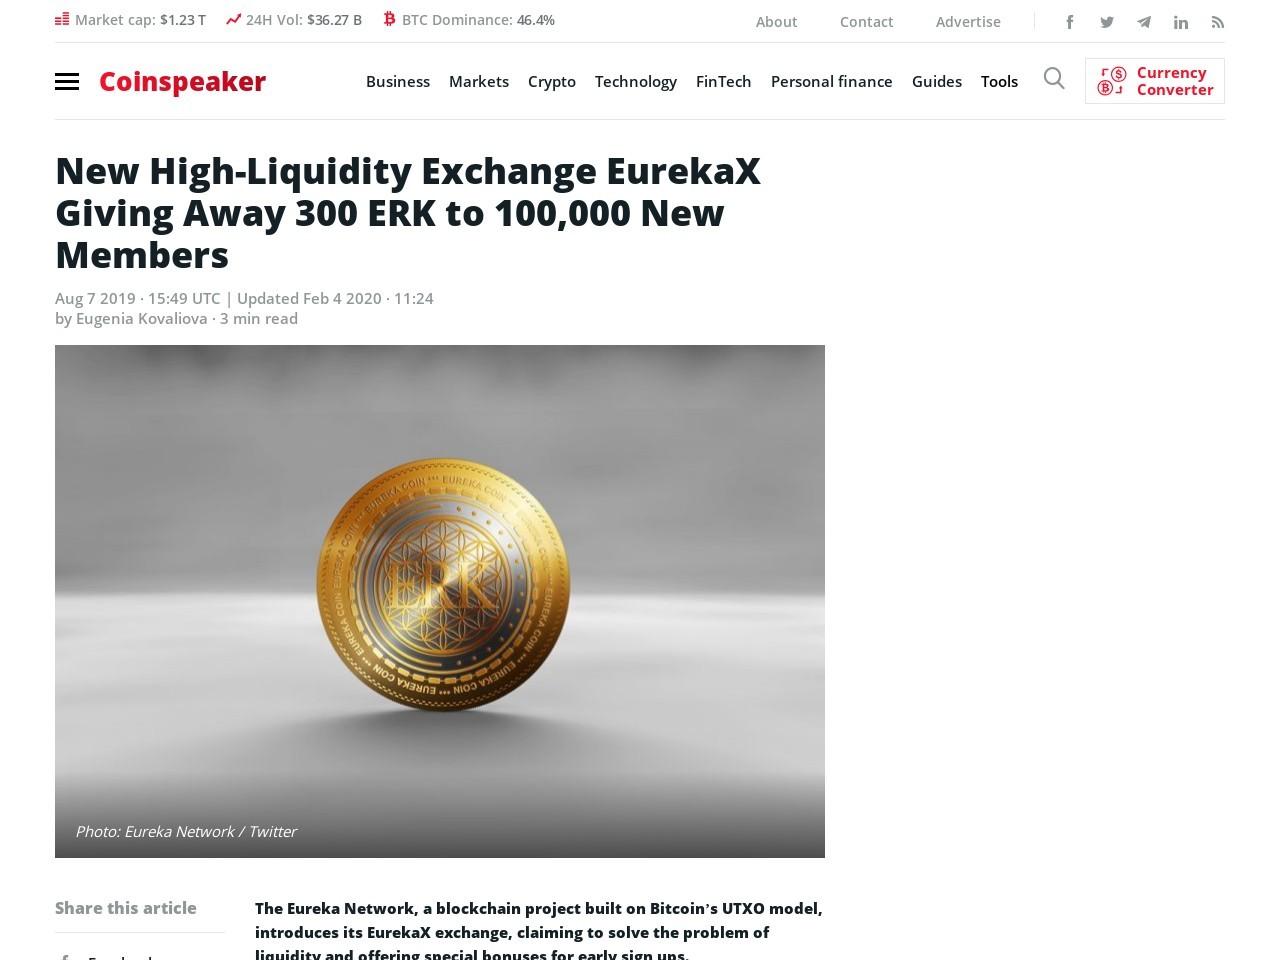 New High-Liquidity Exchange EurekaX Giving Away 300 ERK to 100,000 New Members